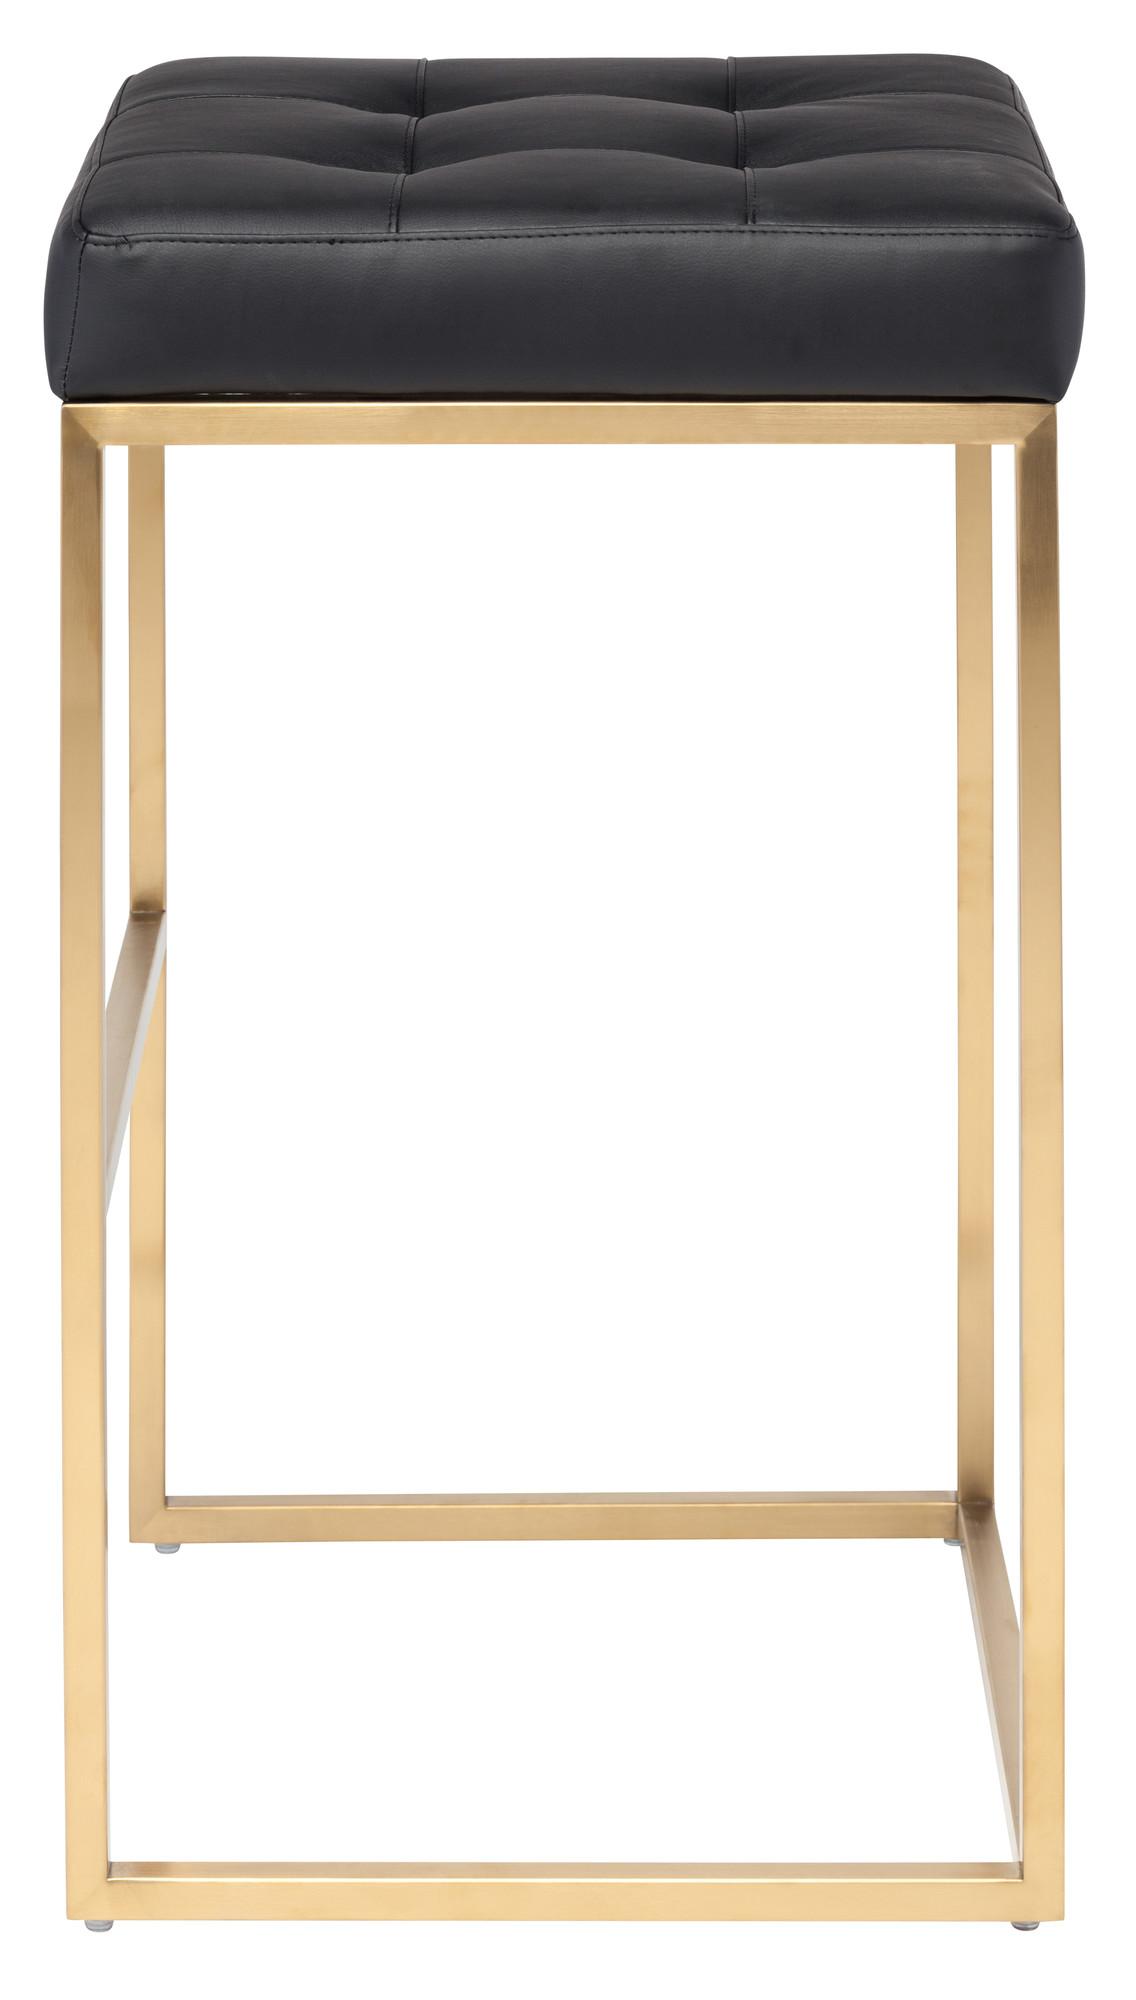 nuevo-chi-black-stool-gold-frame.jpg